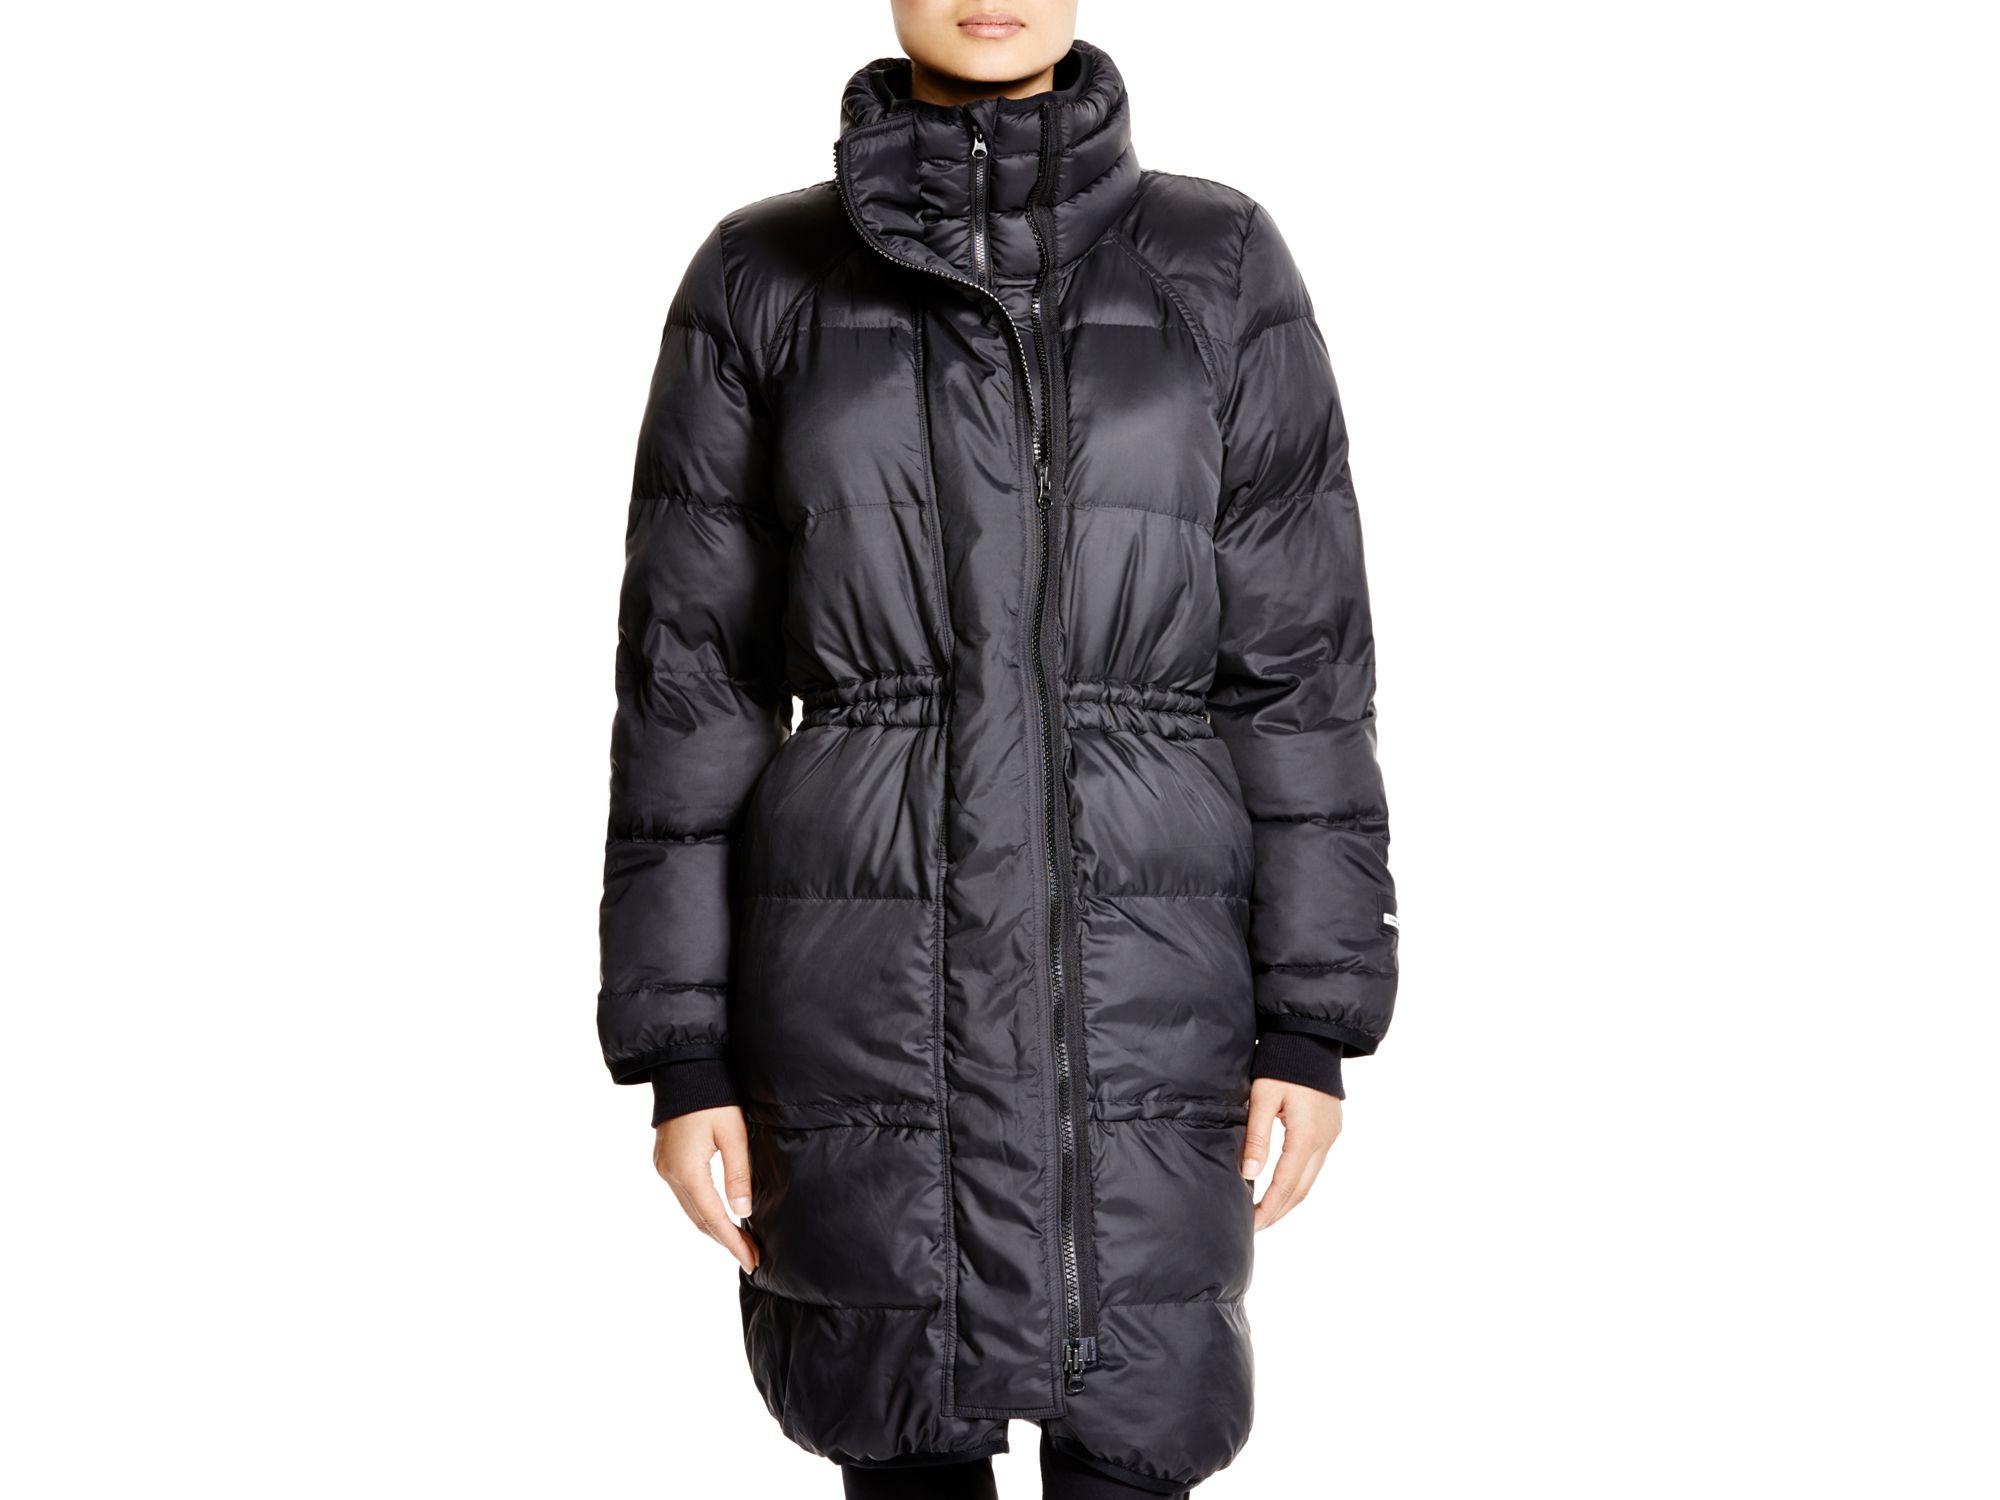 f962ab979 adidas By Stella McCartney Quilted Jacket in Black - Lyst